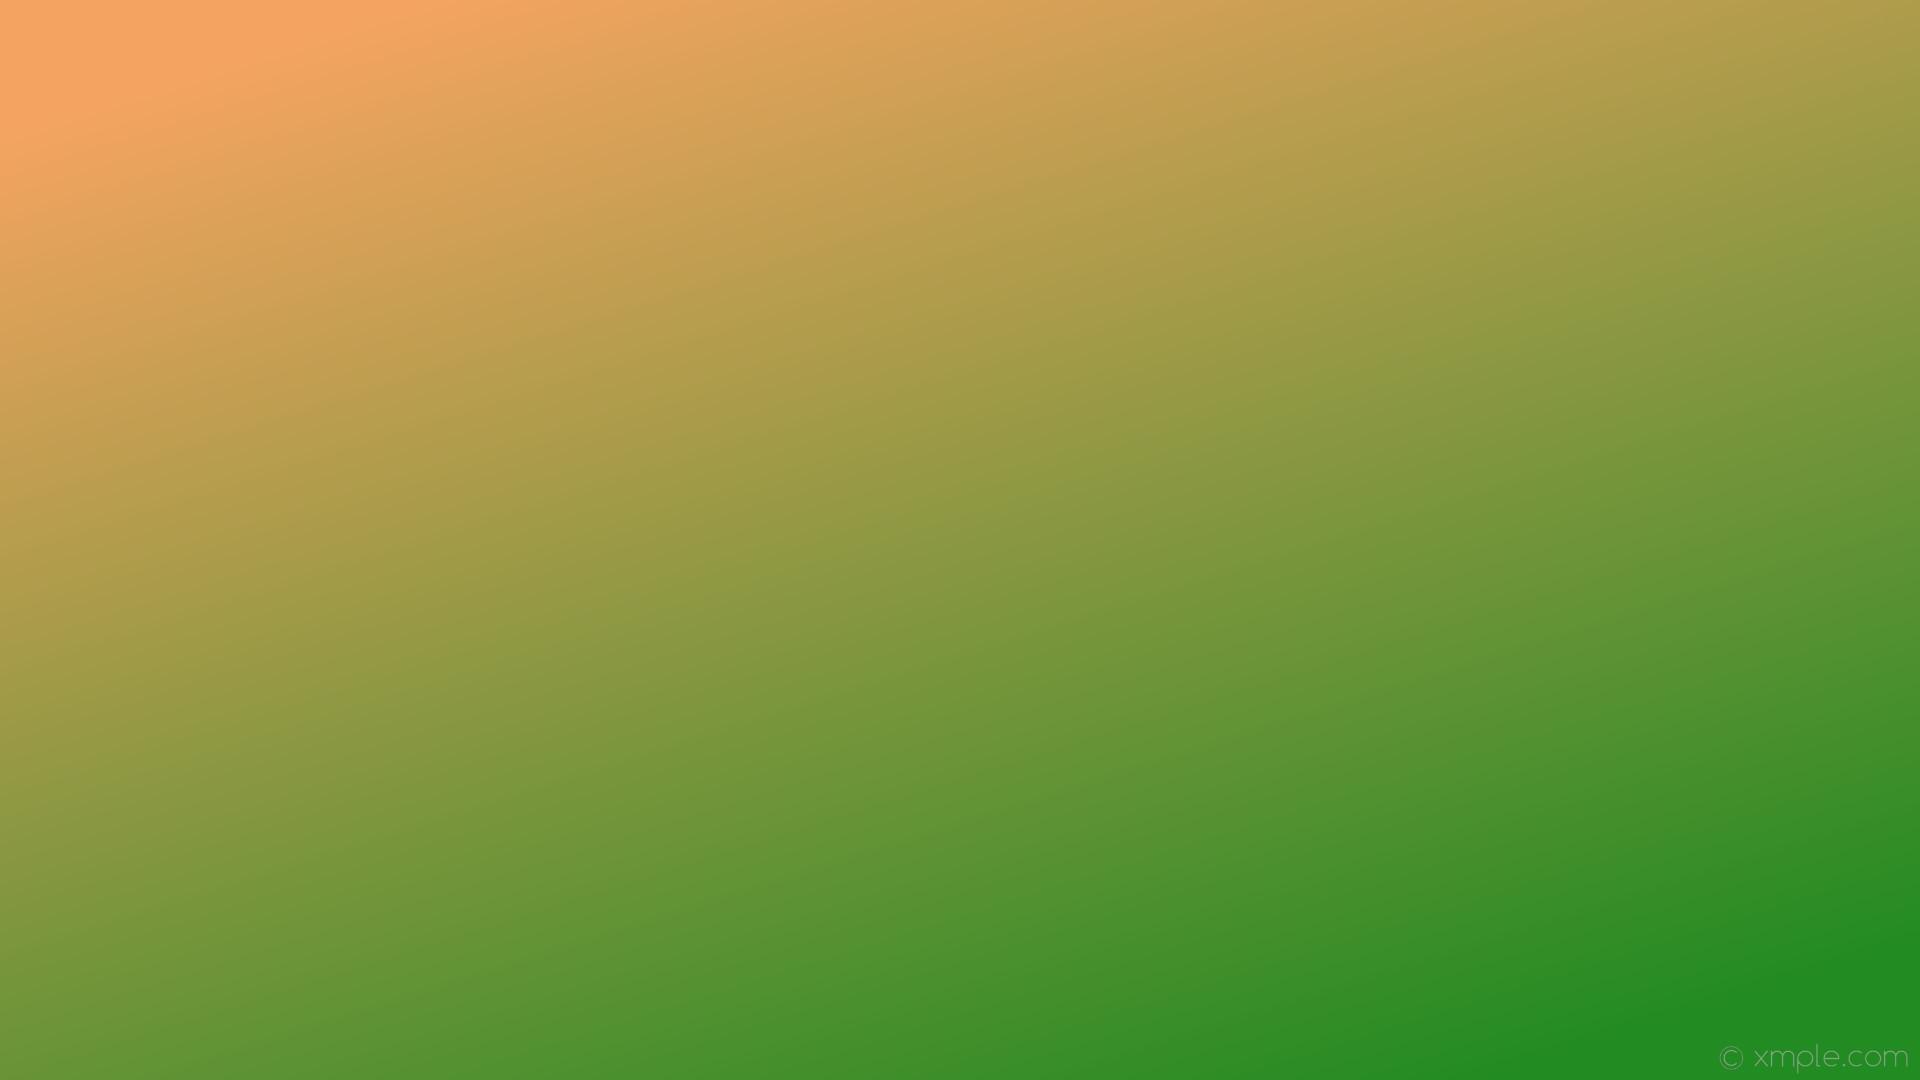 wallpaper linear brown green gradient sandy brown forest green #f4a460  #228b22 135°